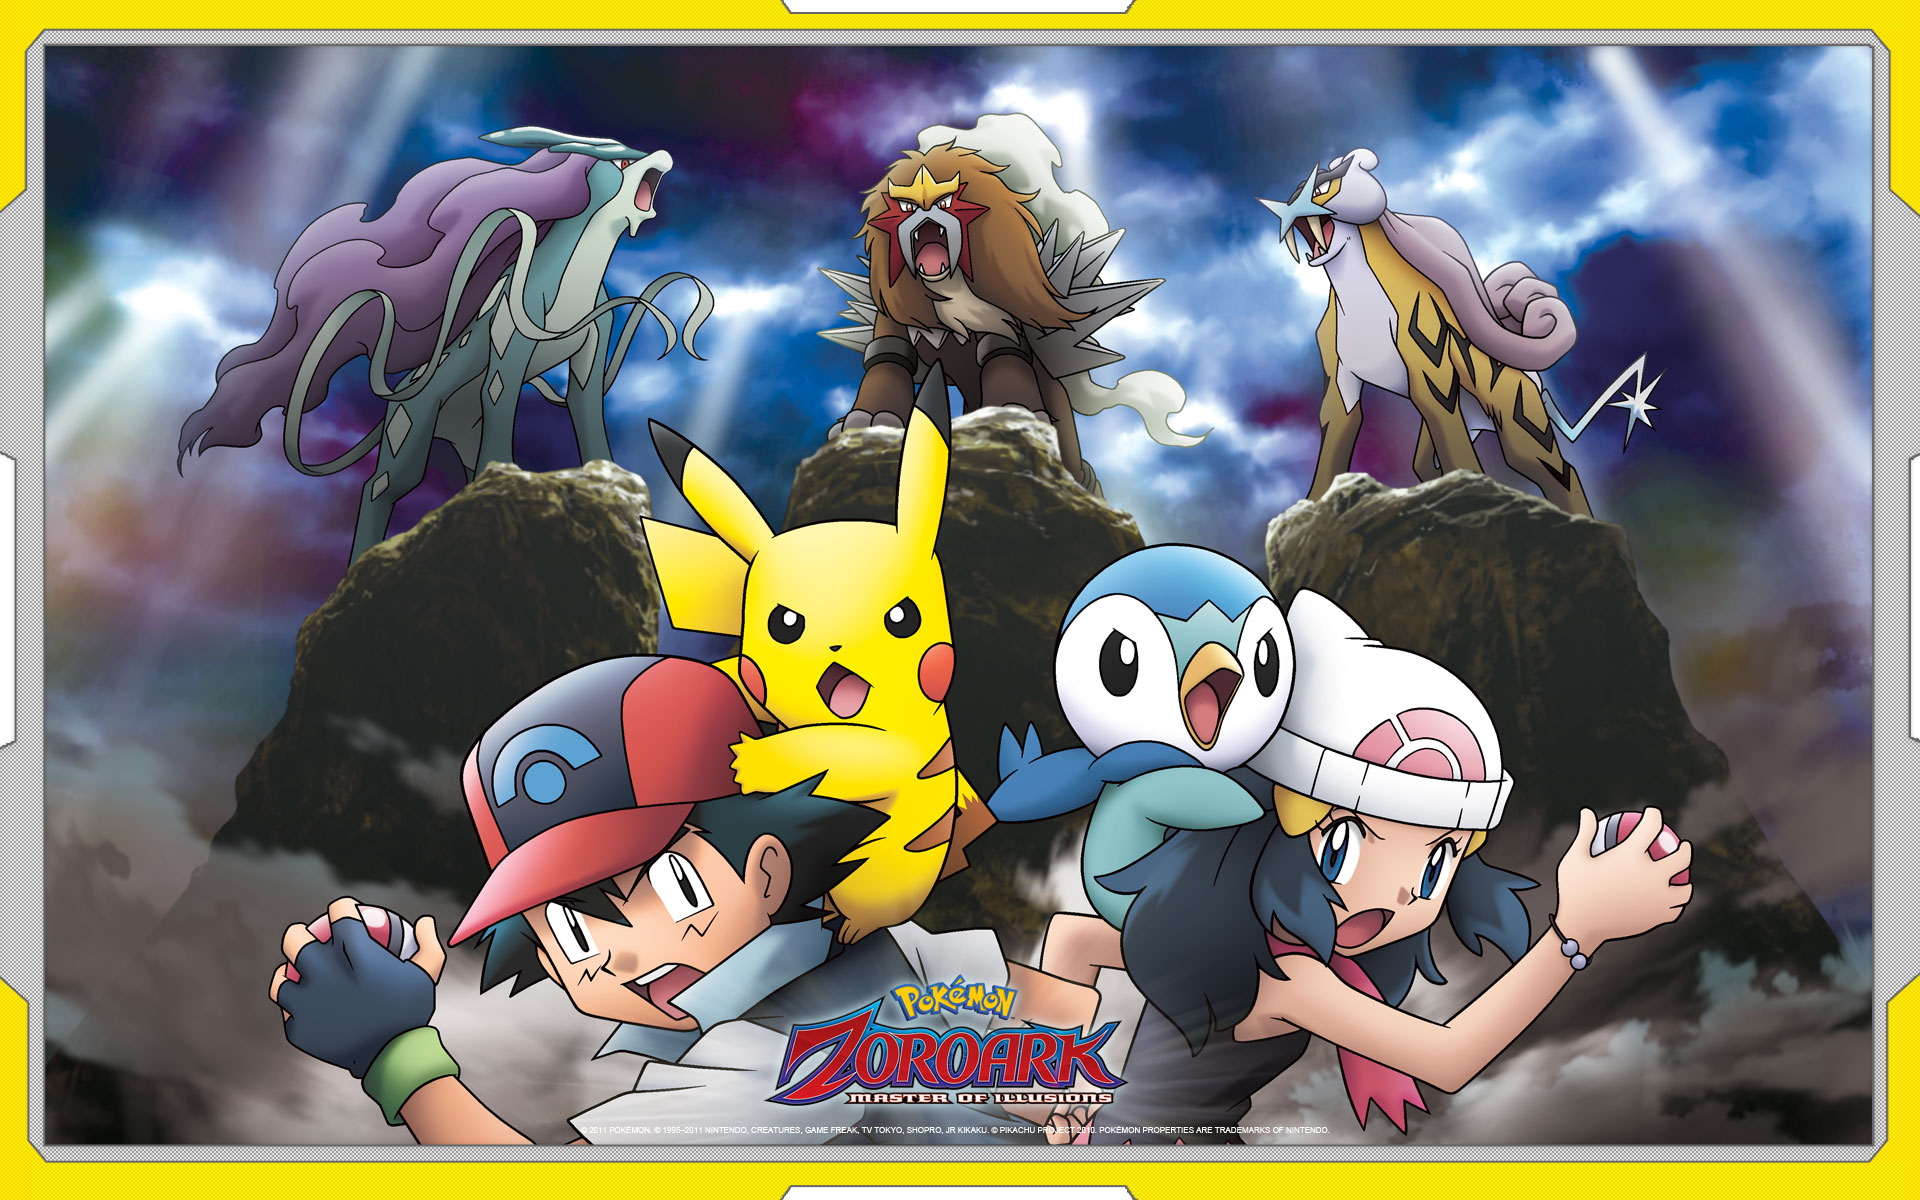 The ficial Pokémon Website